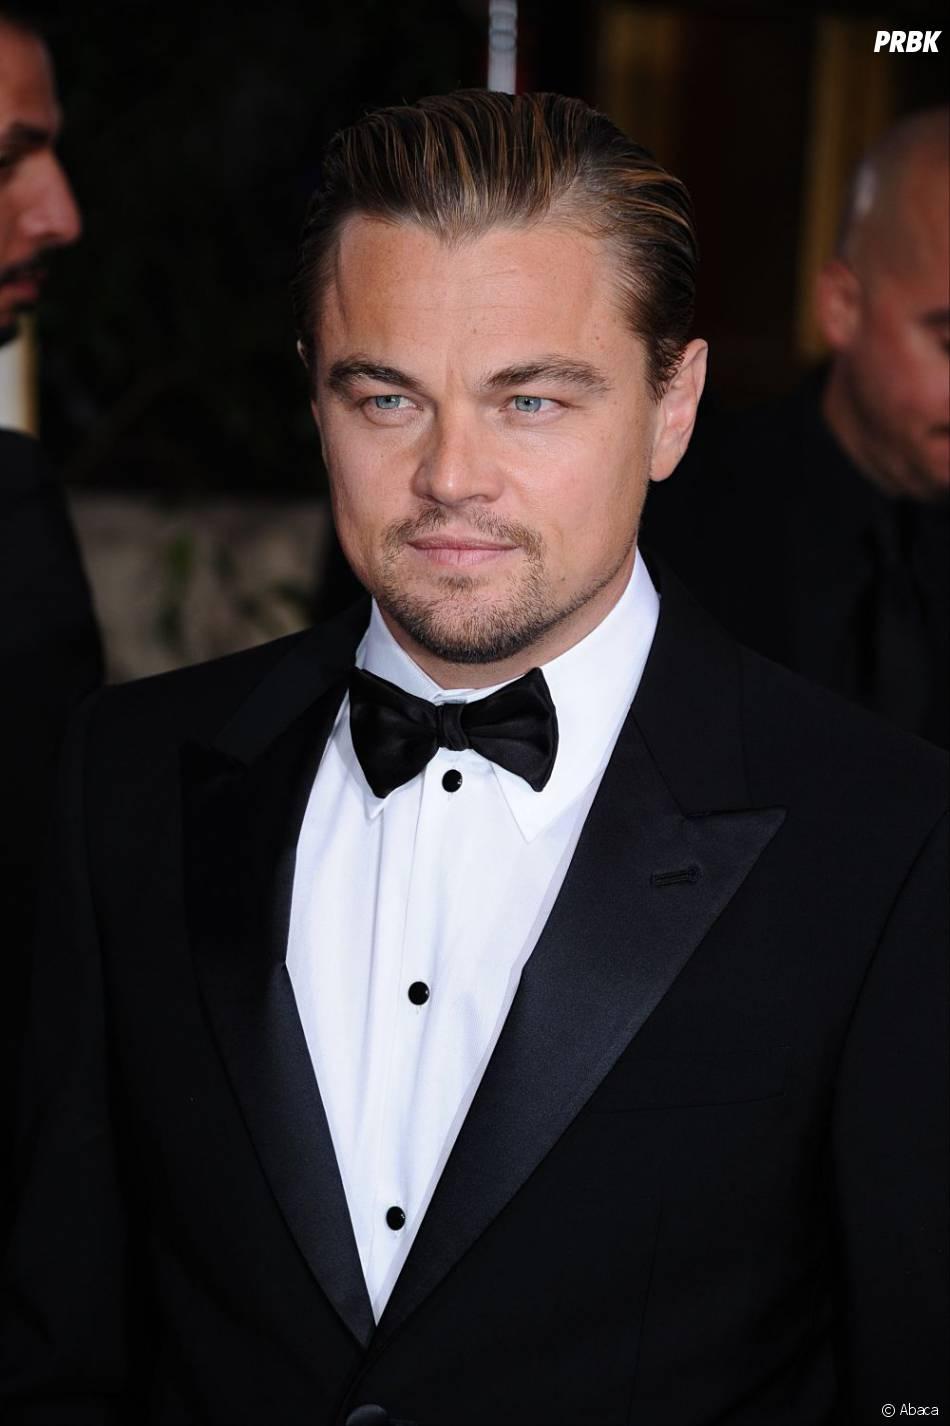 Leonardo DiCaprio serait la star la plus intelligente sur Twitter selon le TIME